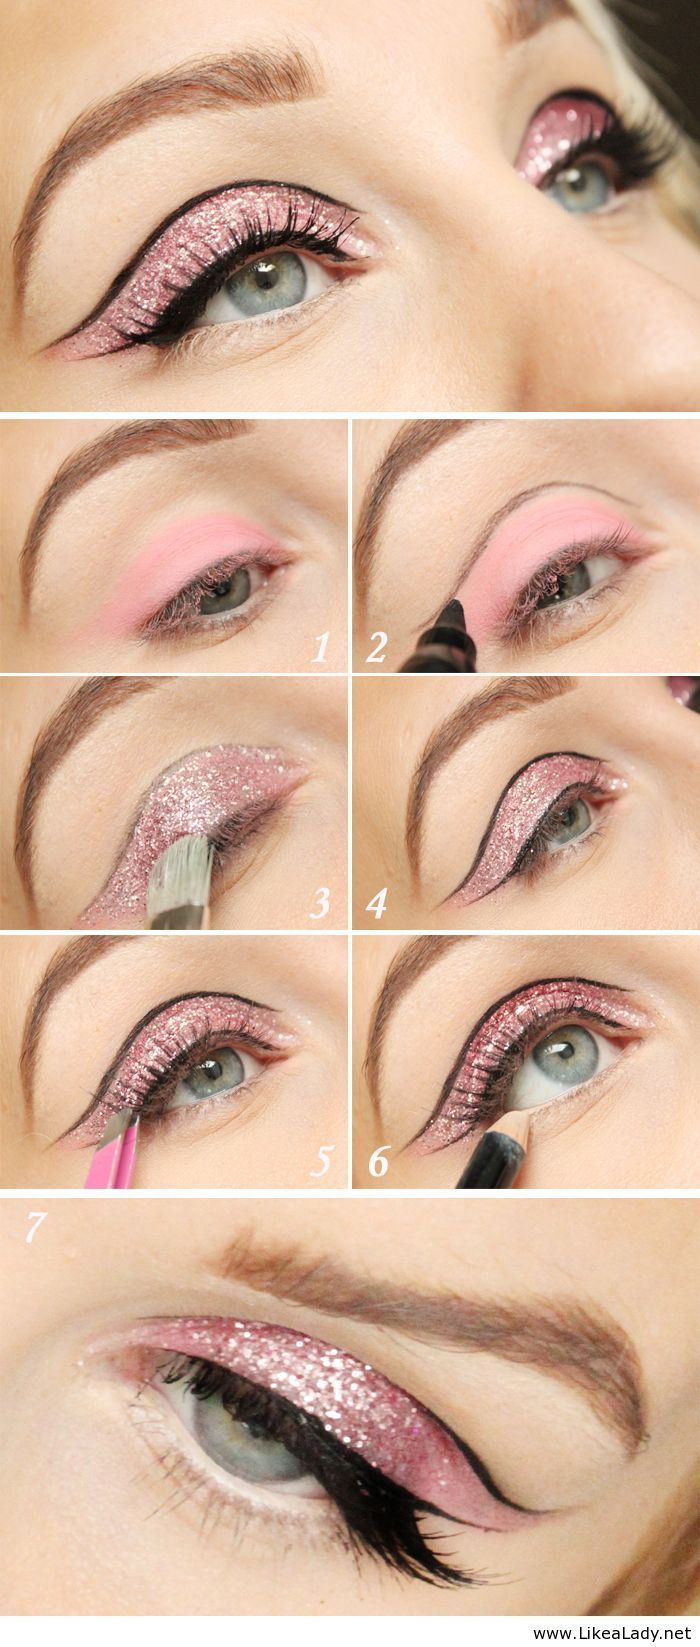 Pink glitter eye makeup tutorial . I wud omit the fake crease to make it subtle